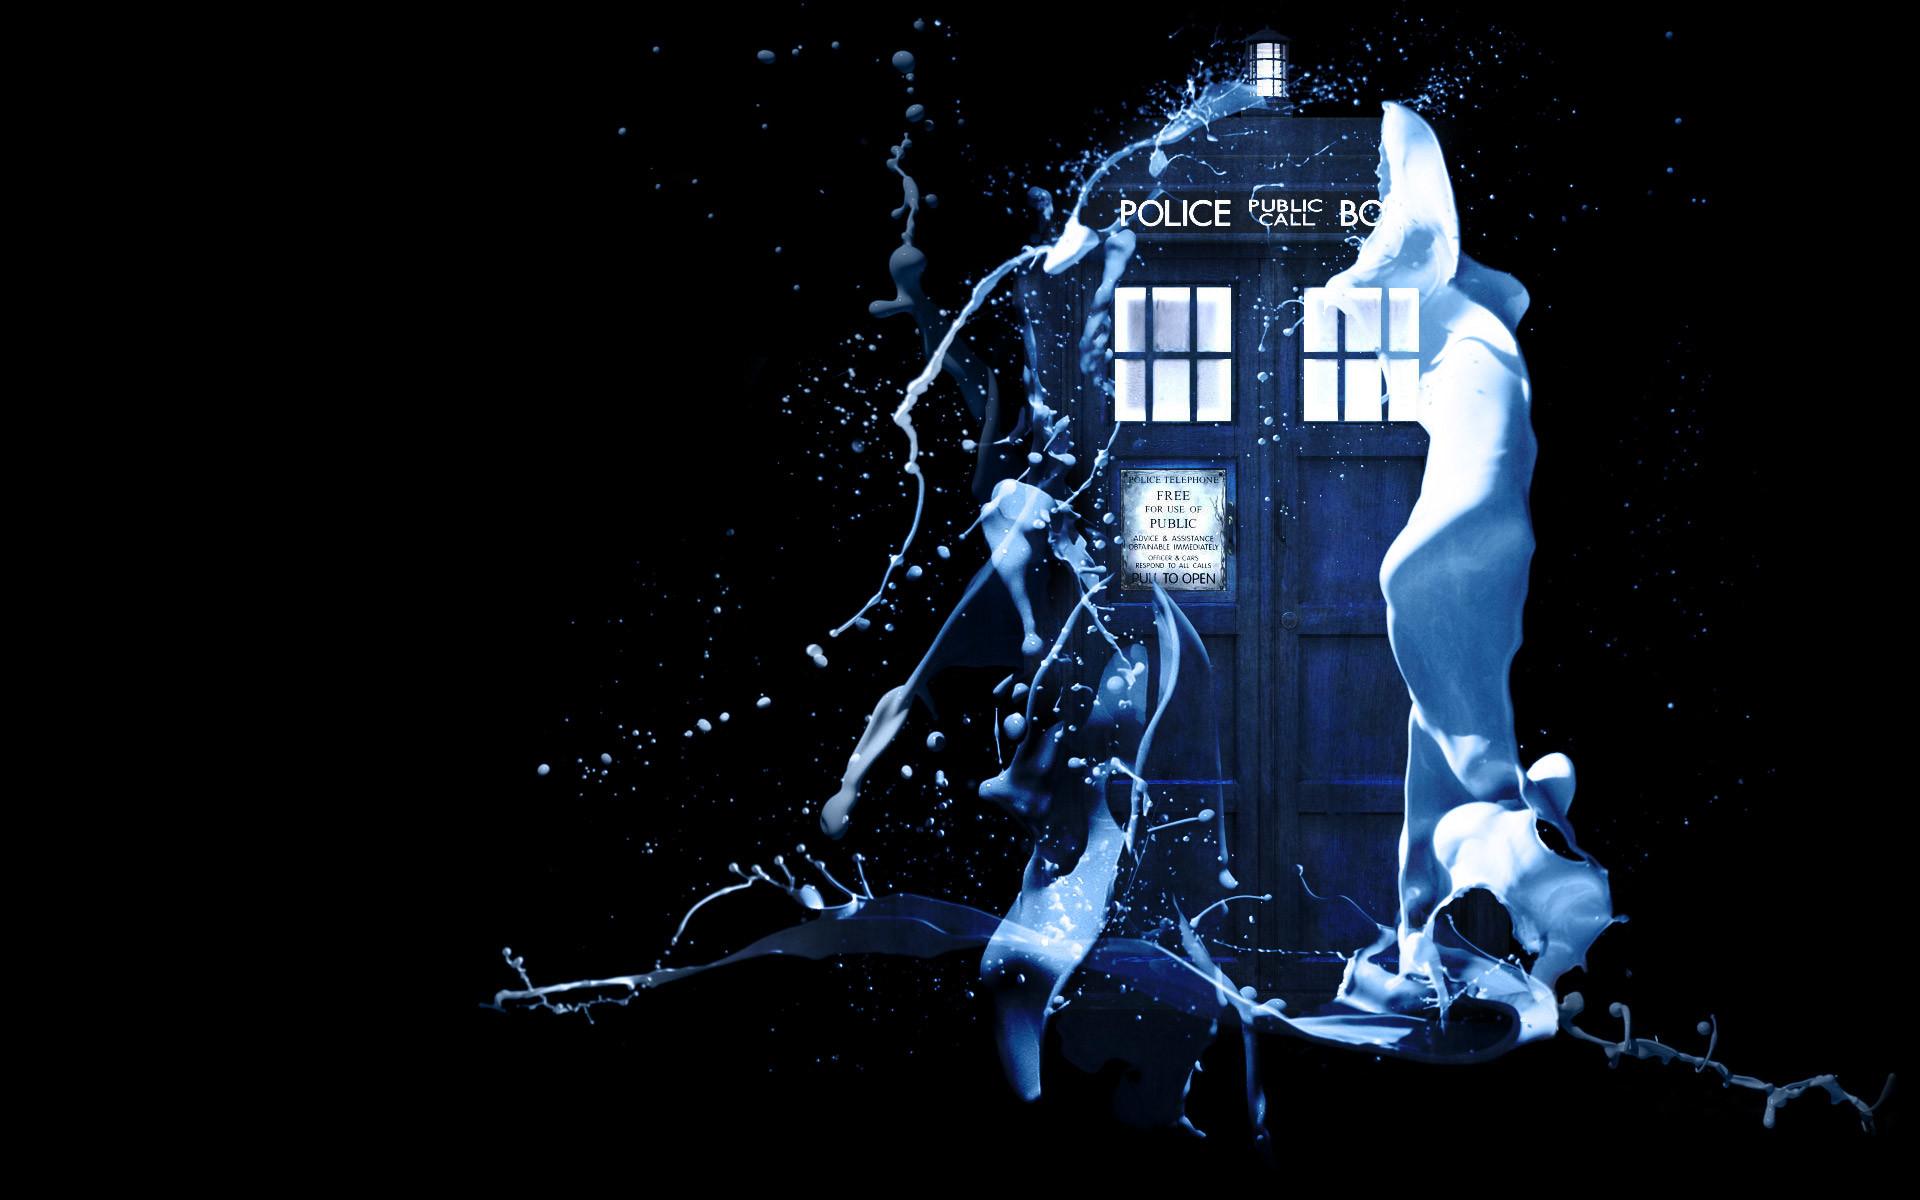 TARDIS Wallpapers (83 Wallpapers)